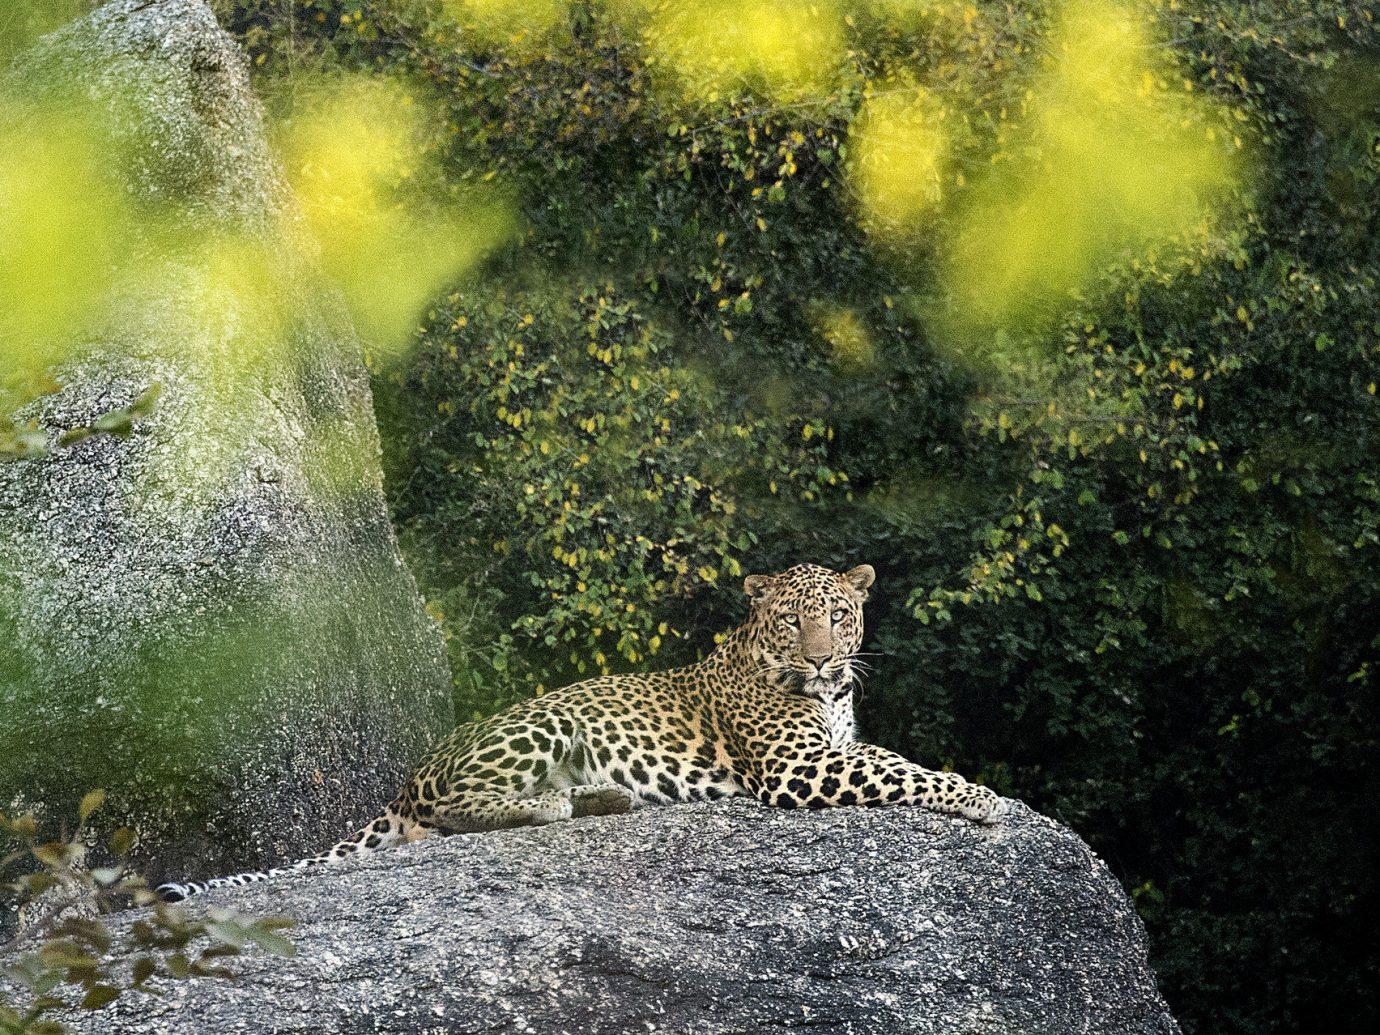 Hotels Safari big cat outdoor animal Nature mammal leopard Wildlife fauna cat like mammal Jungle sunlight woodland